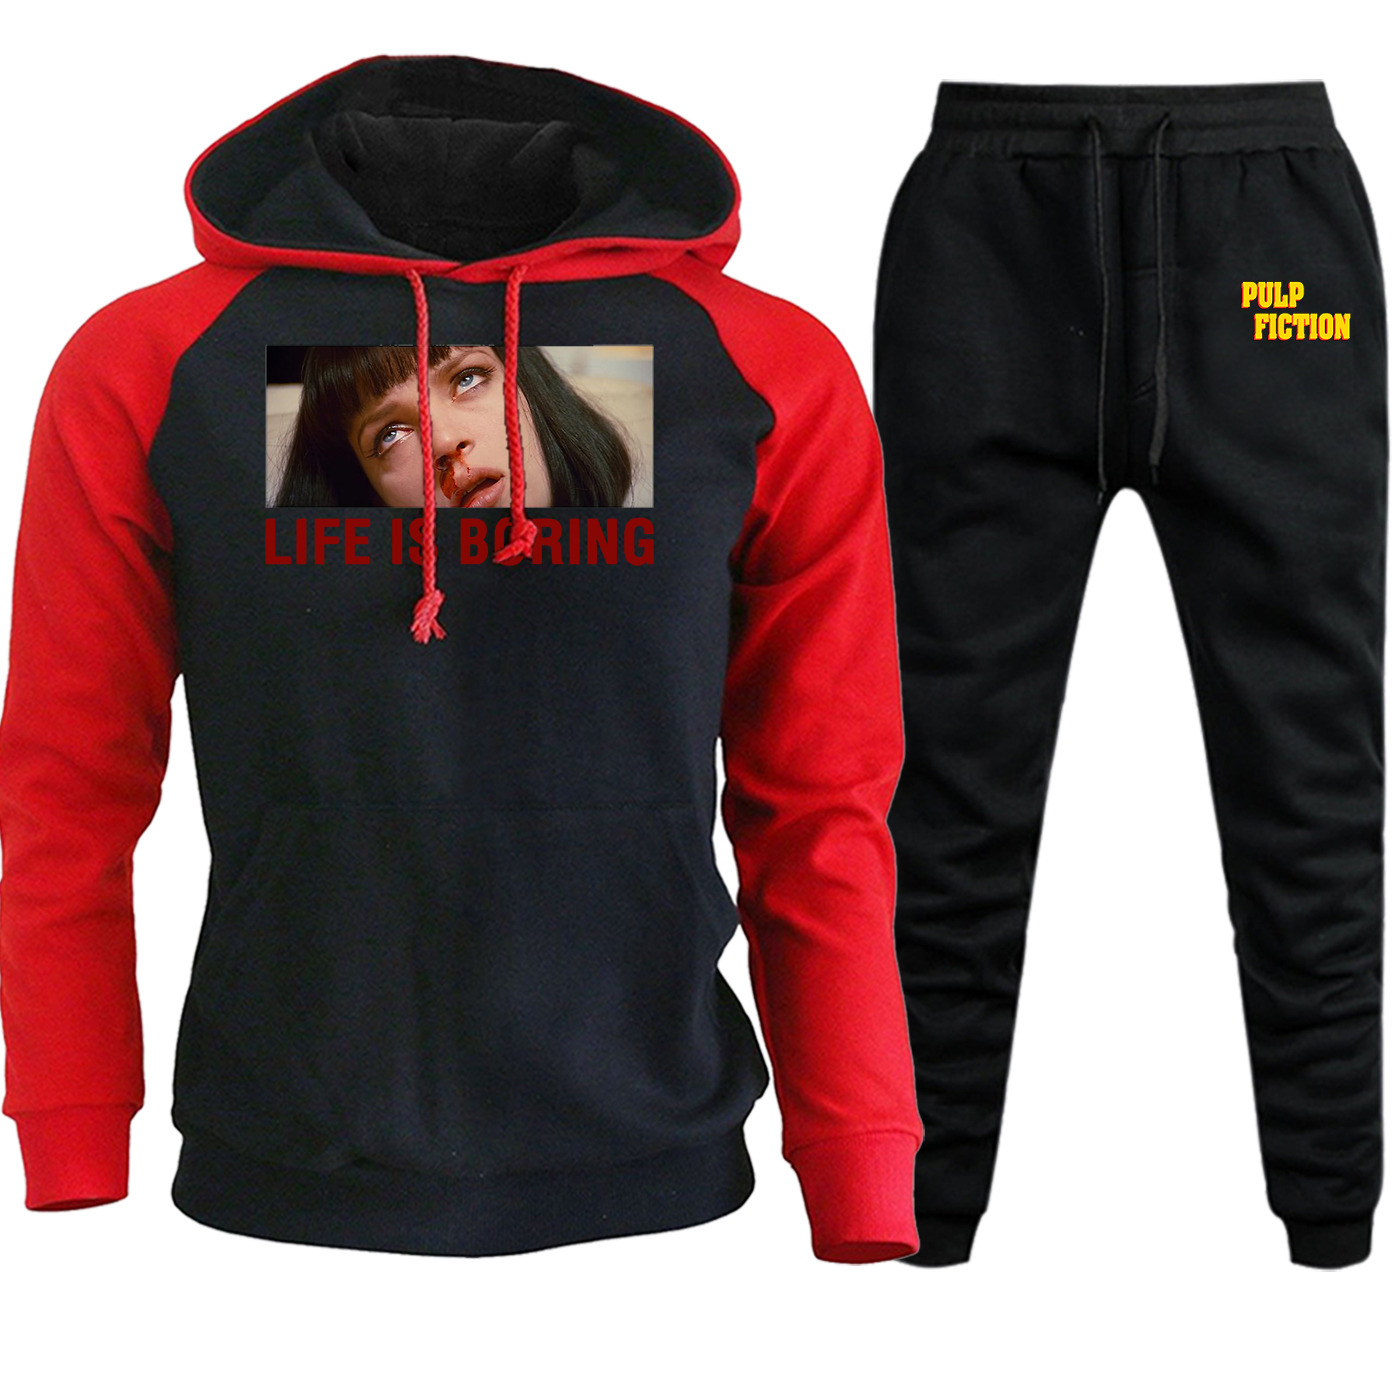 2019 Autumn Winter Pulp Fiction Life Is Boring Hoodie Men Raglan Sweatshirts Hip Hop Pullover Suit Male Hooded+Pants 2 Piece Set